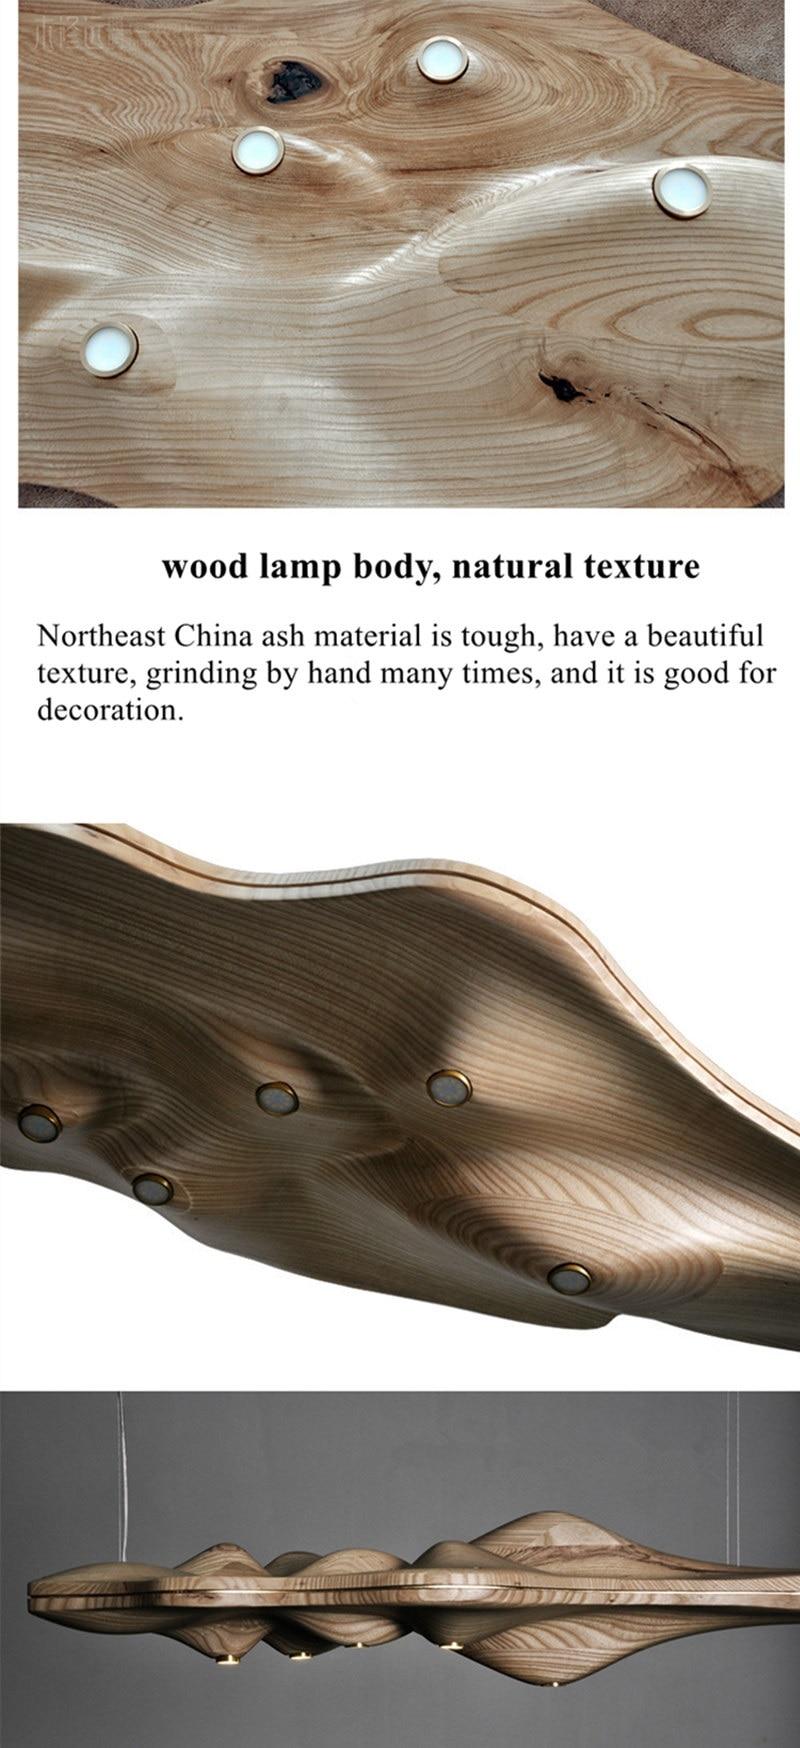 estudo, cozinha, estilo criativo zen retrô, lâmpada de ramo